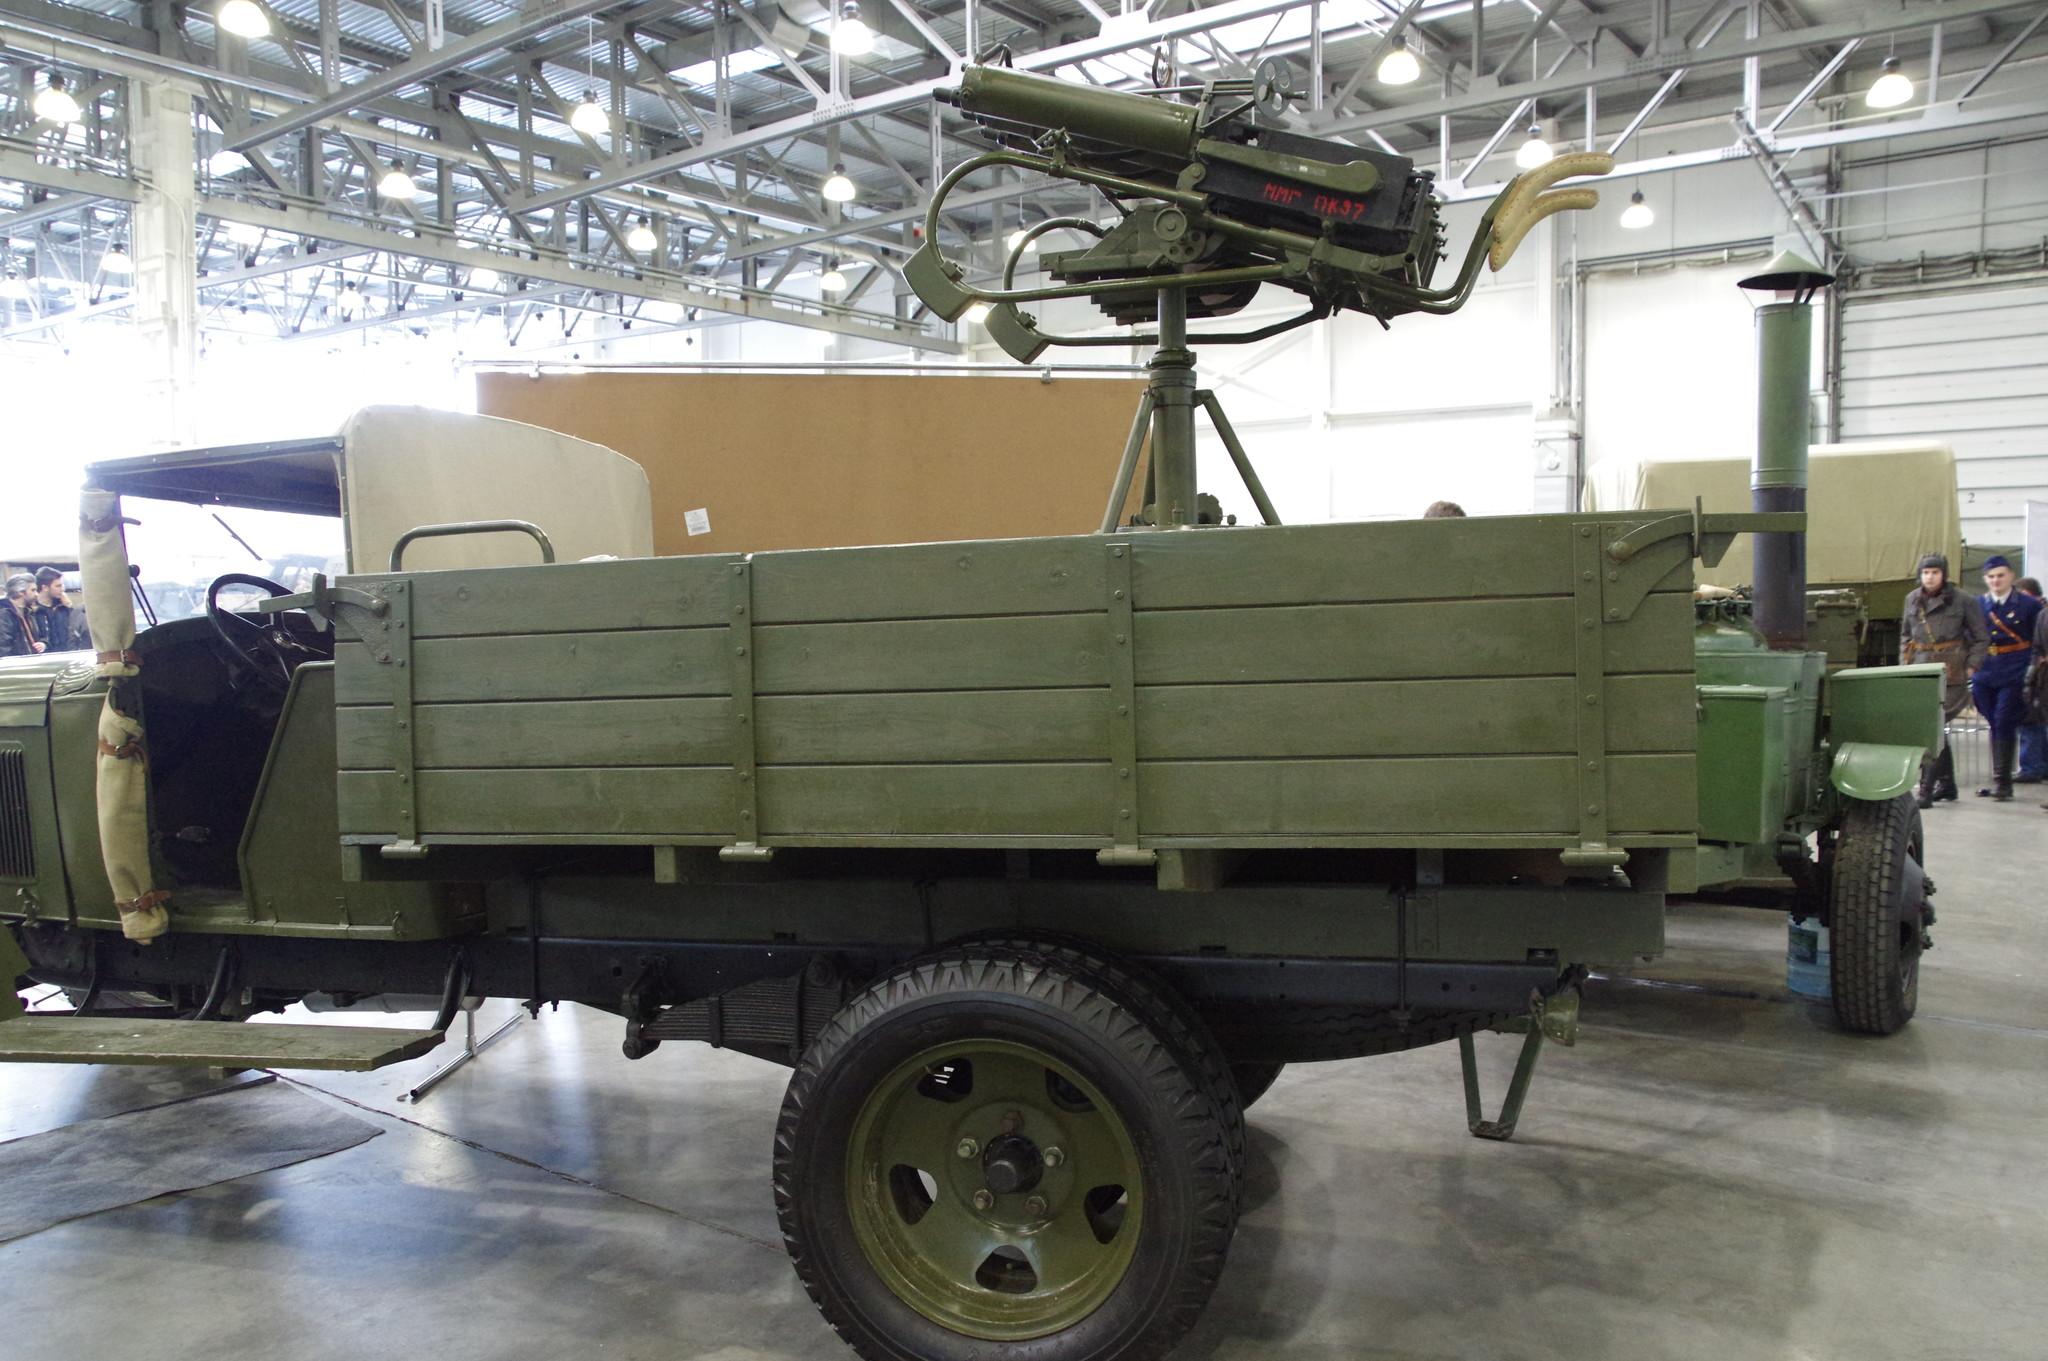 Счетверённая 7,62-мм зенитная пулемётная установка обр. 1931 г. системы Н.Ф. Токарева на шасси грузовика ГАЗ-АА